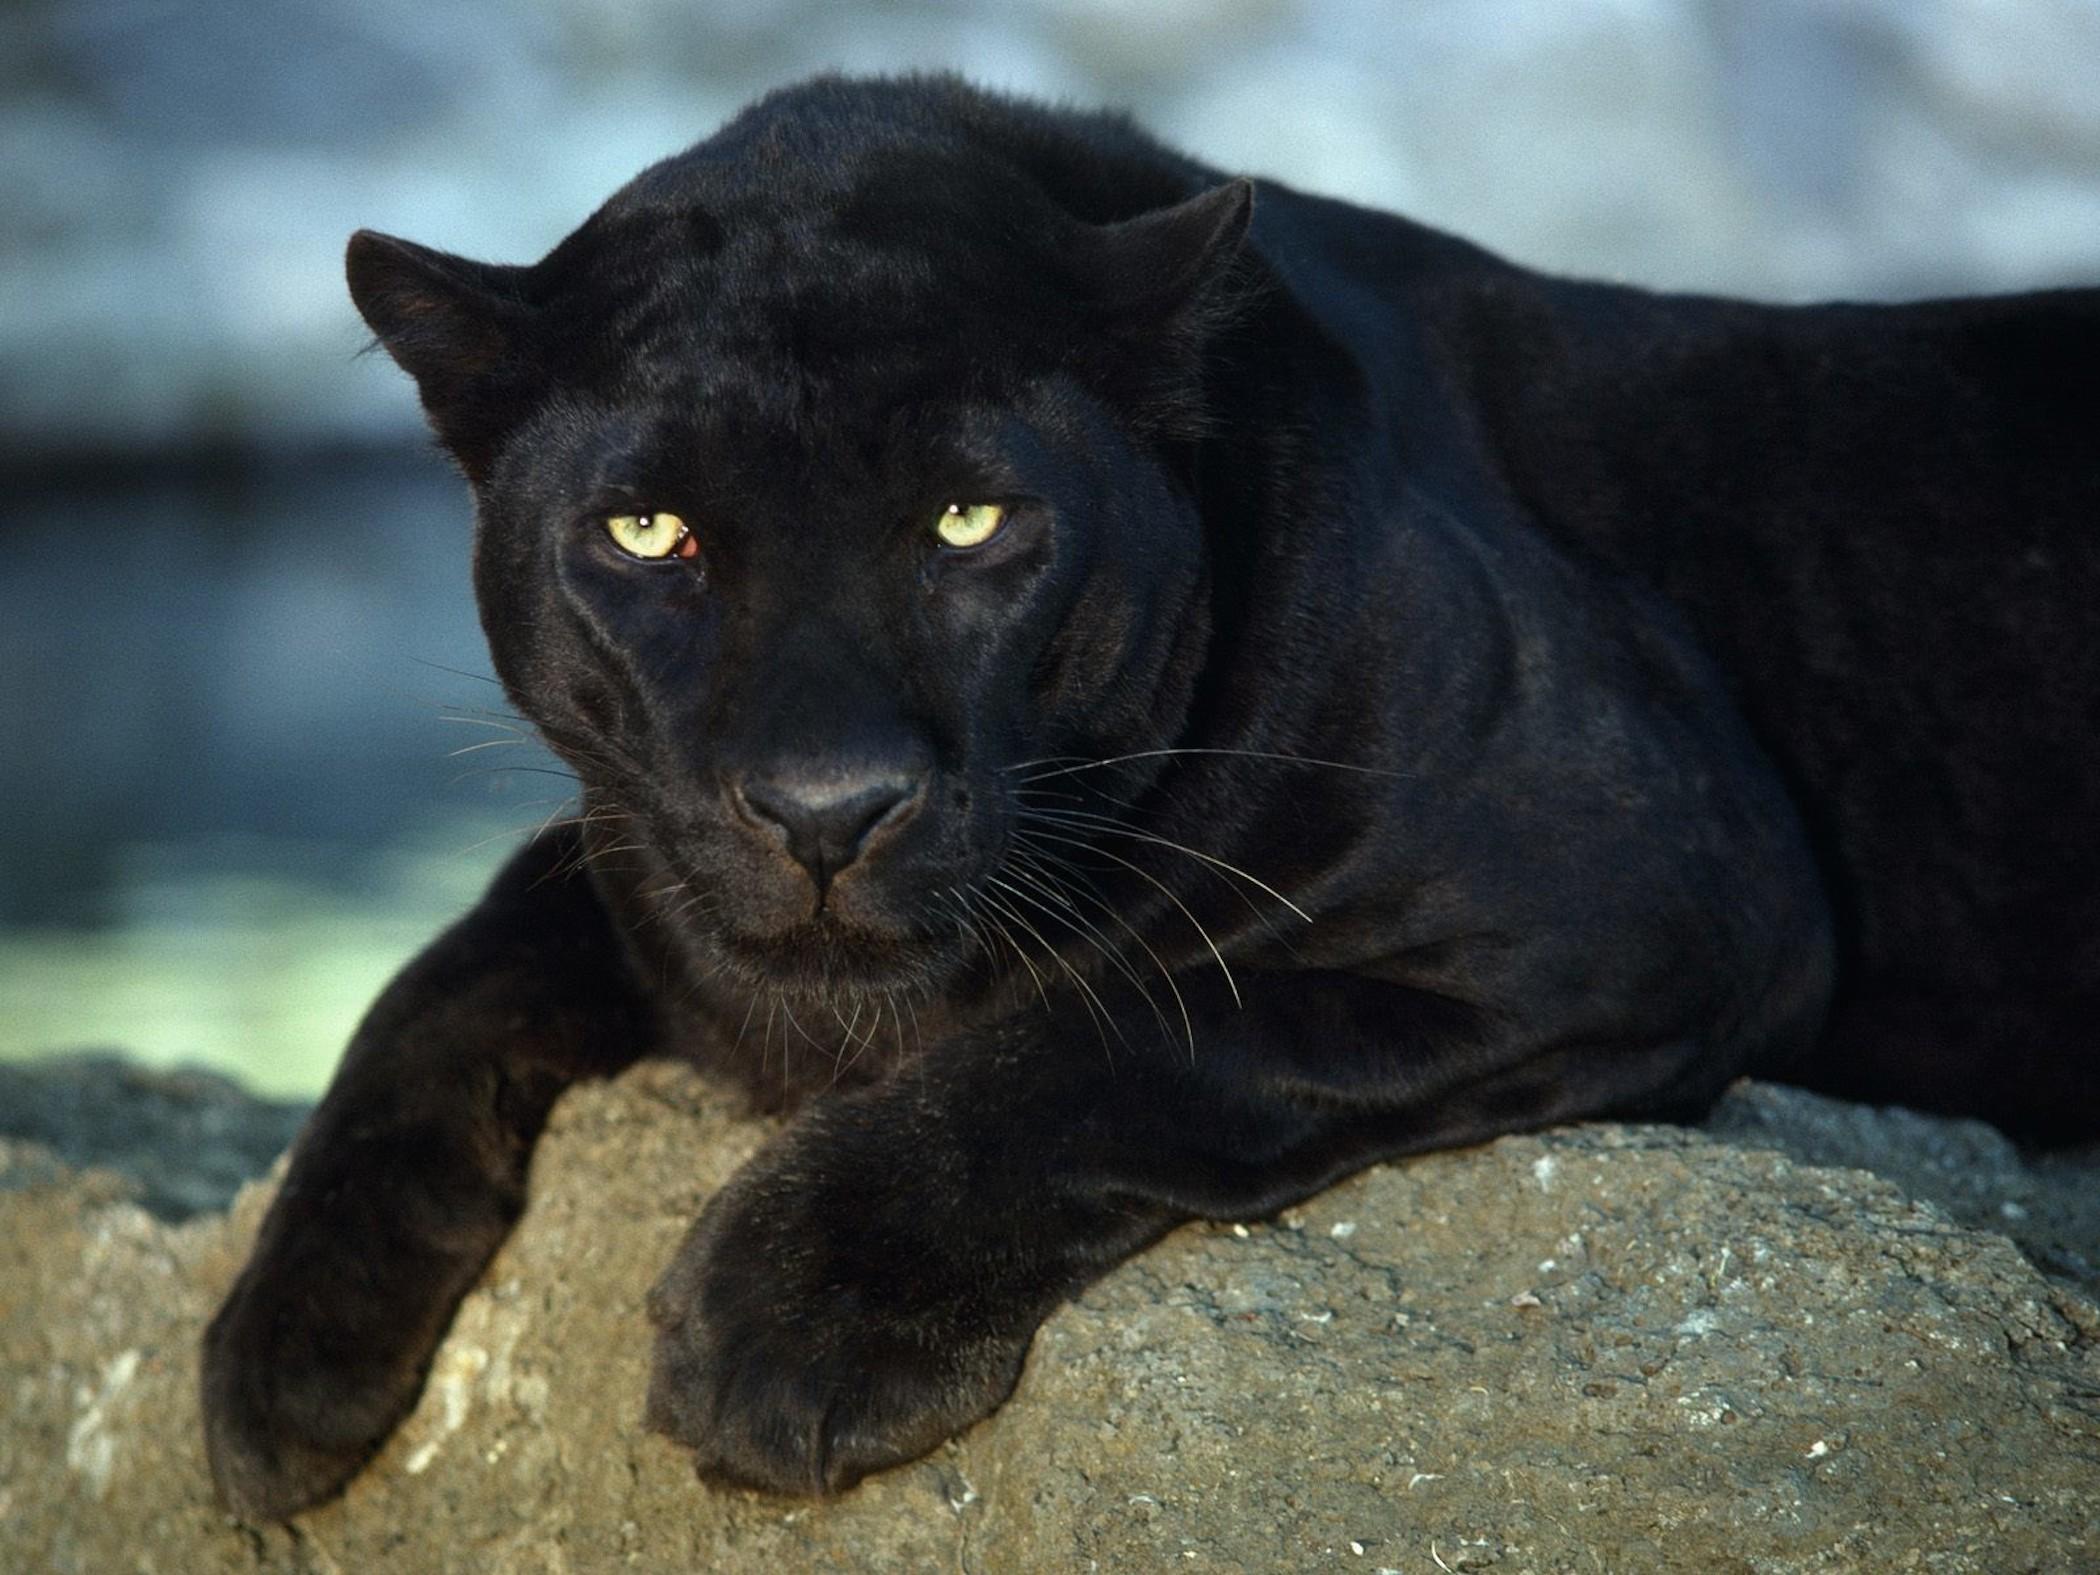 Black Panther Wallpaper  Desktop Phone Downloads 2100x1575